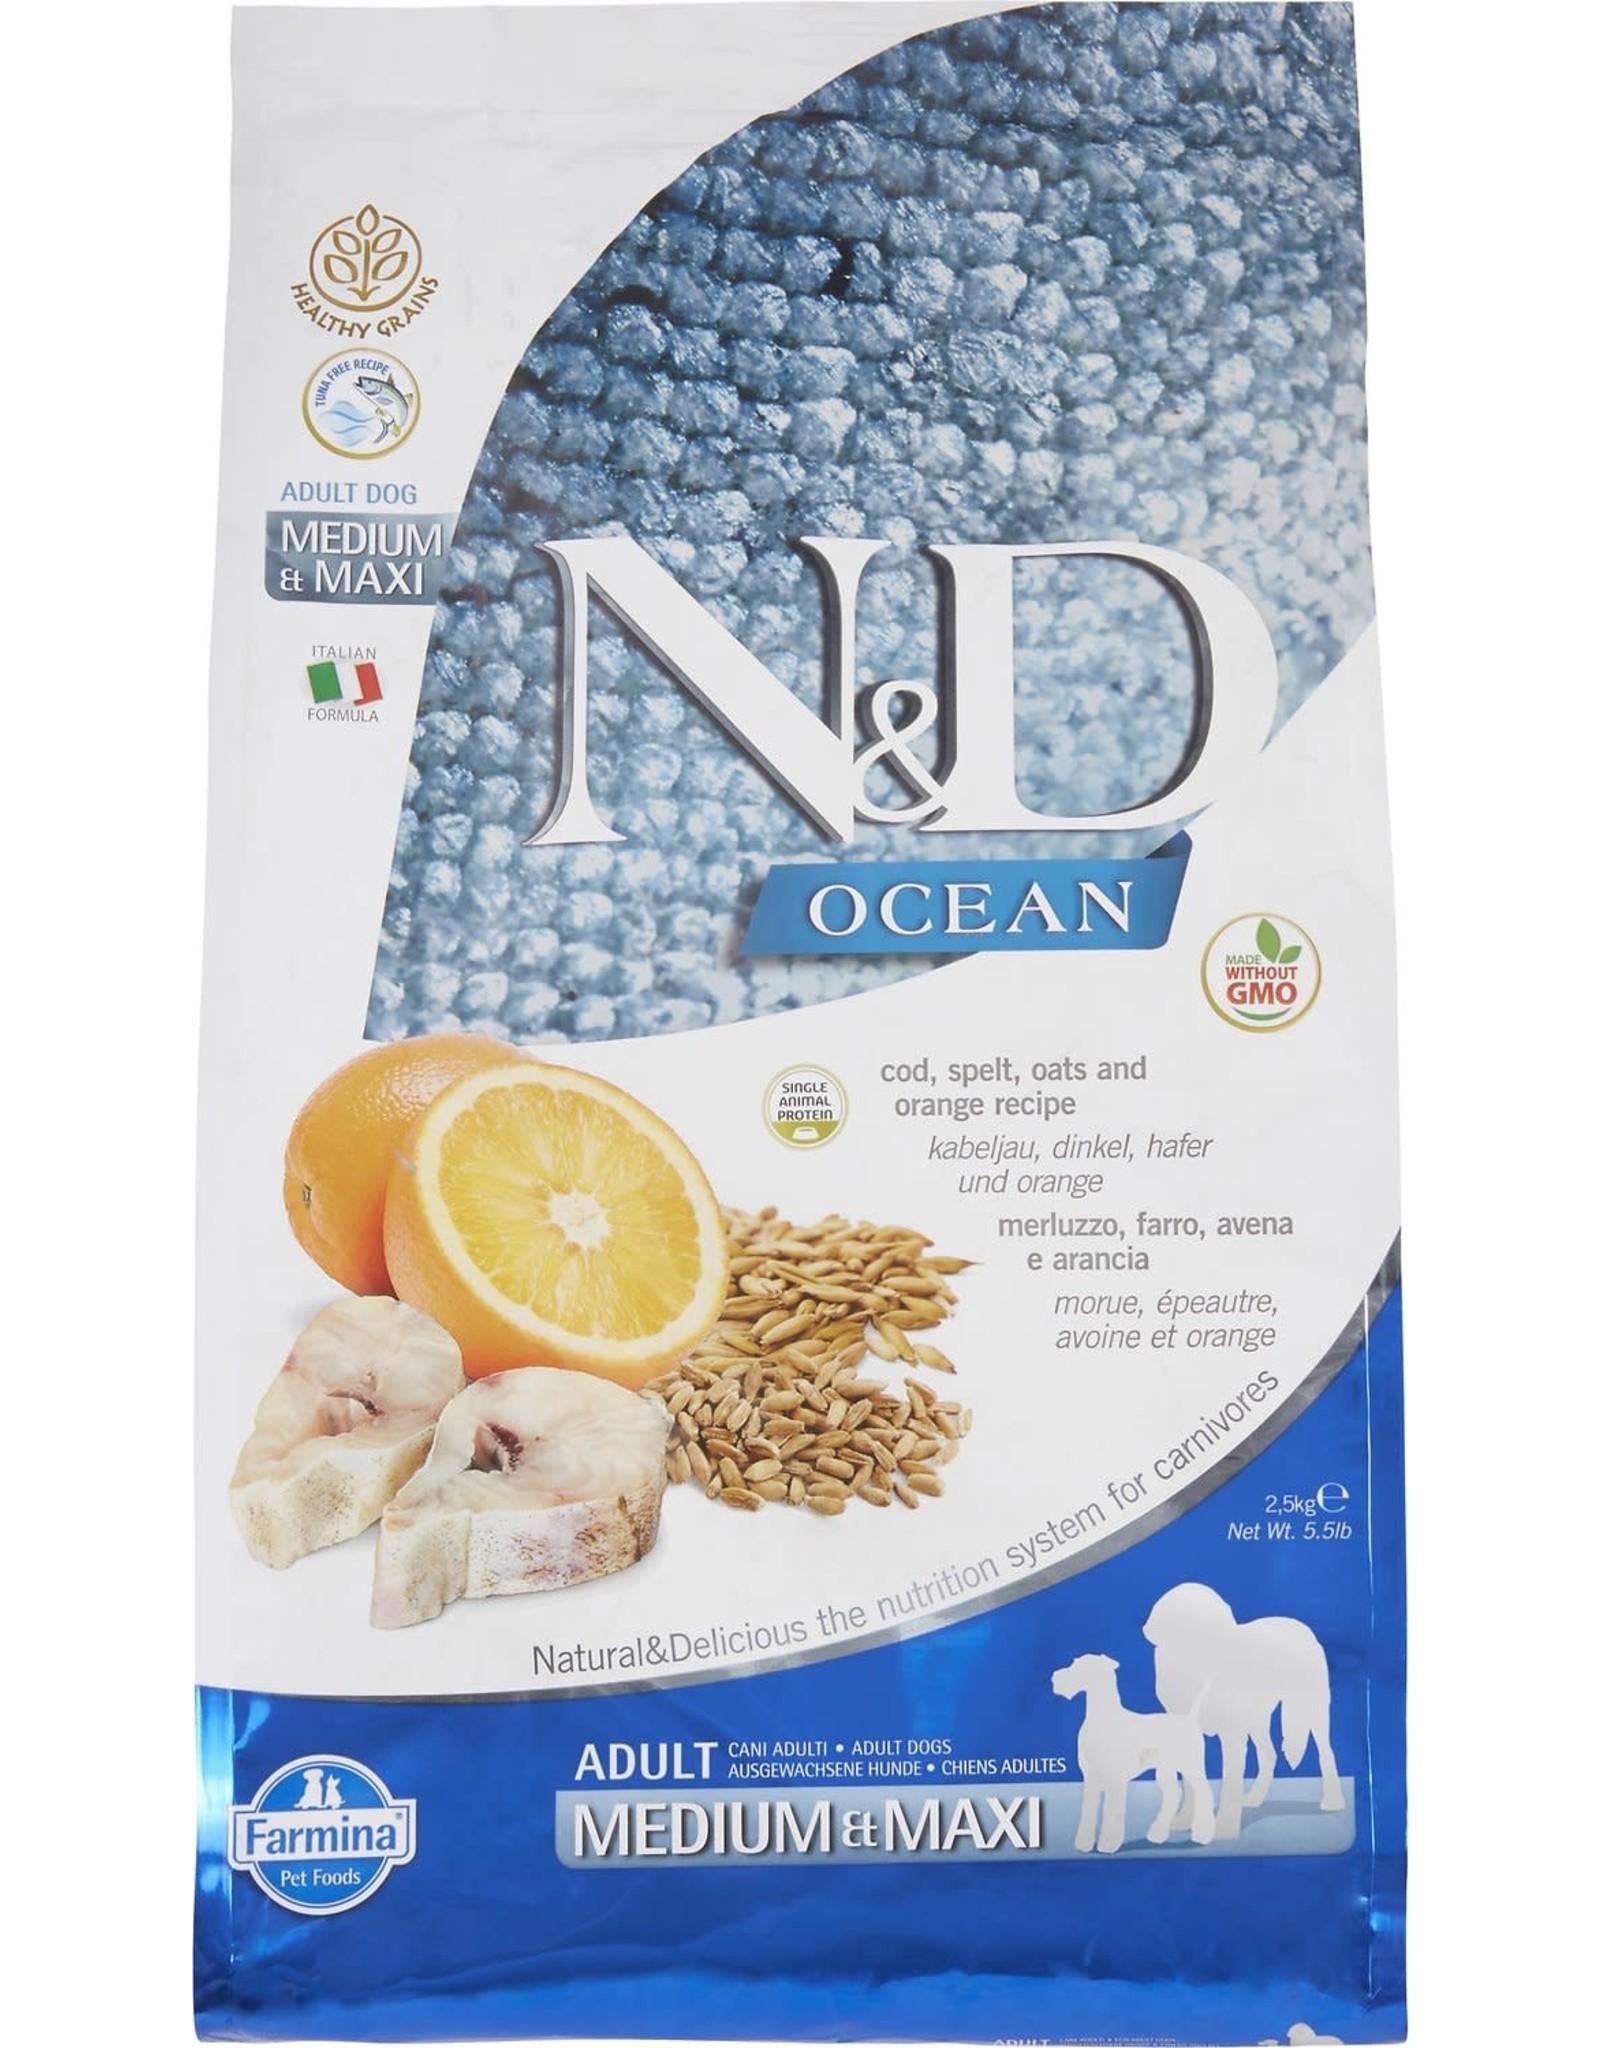 Farmina N&D Dog - Ocean Cod Adult Med/Max 26.5lb